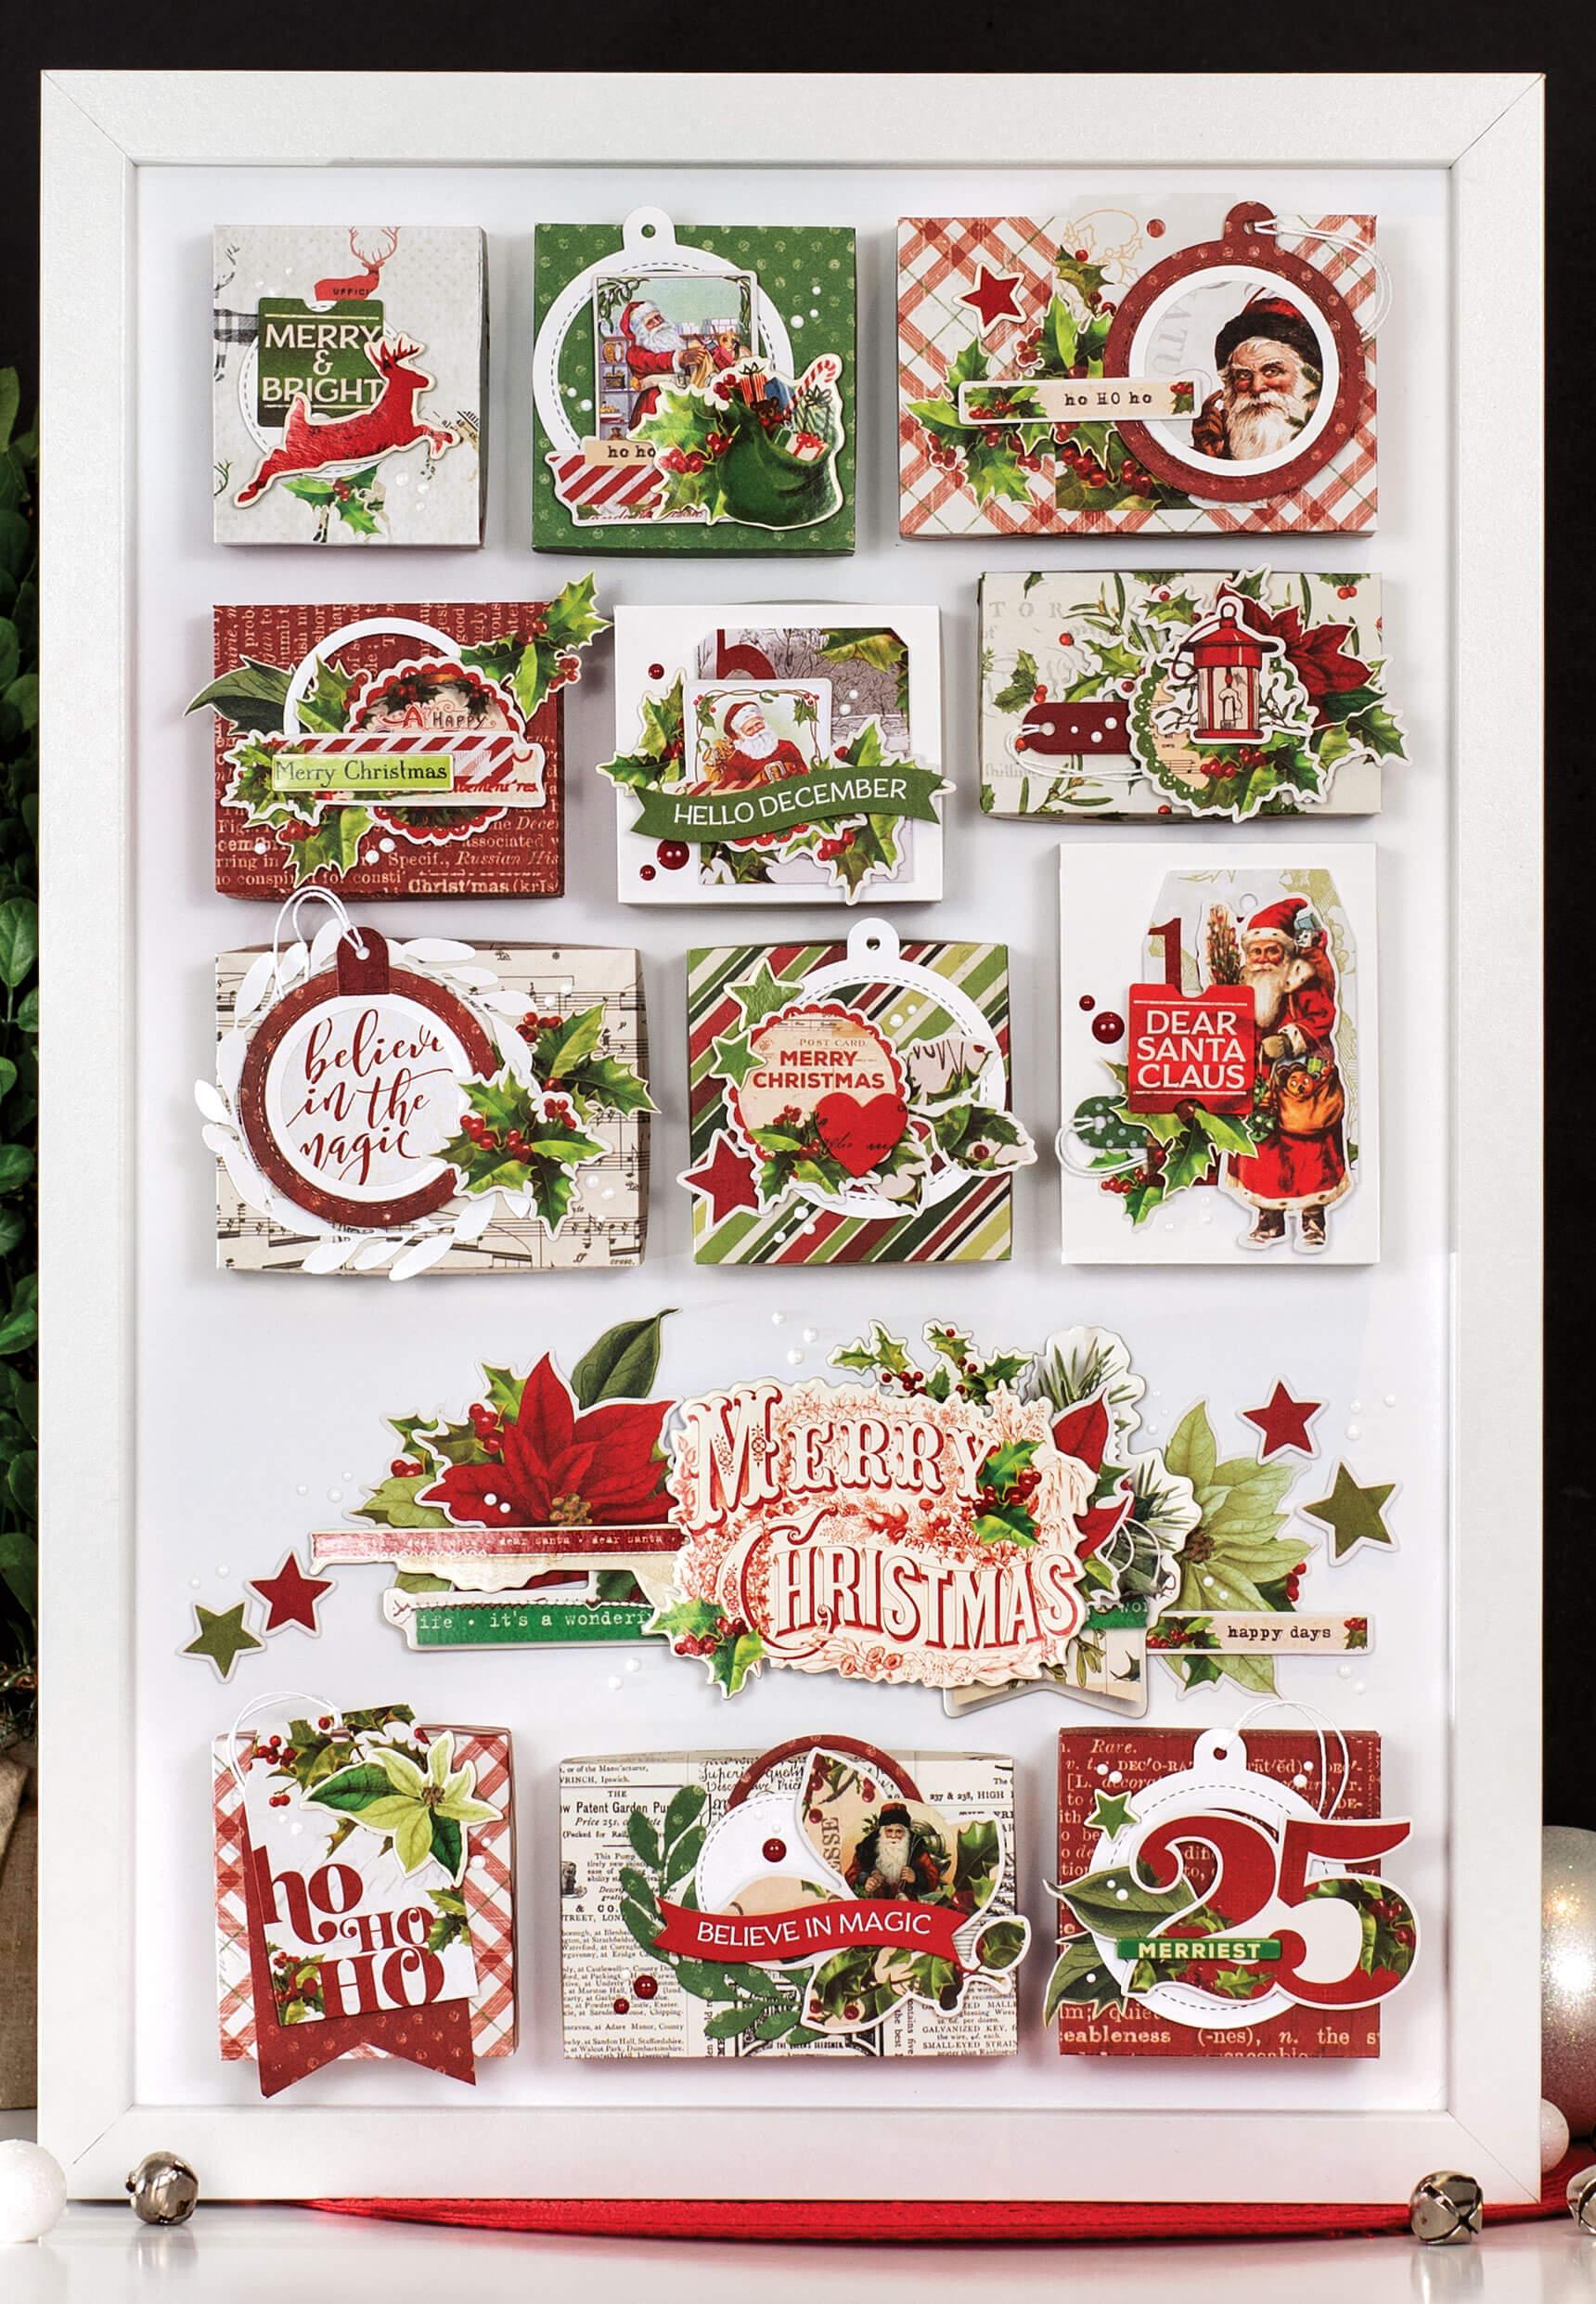 SCT Winter 2018 - Advent Calendar by Anya Lunchenko